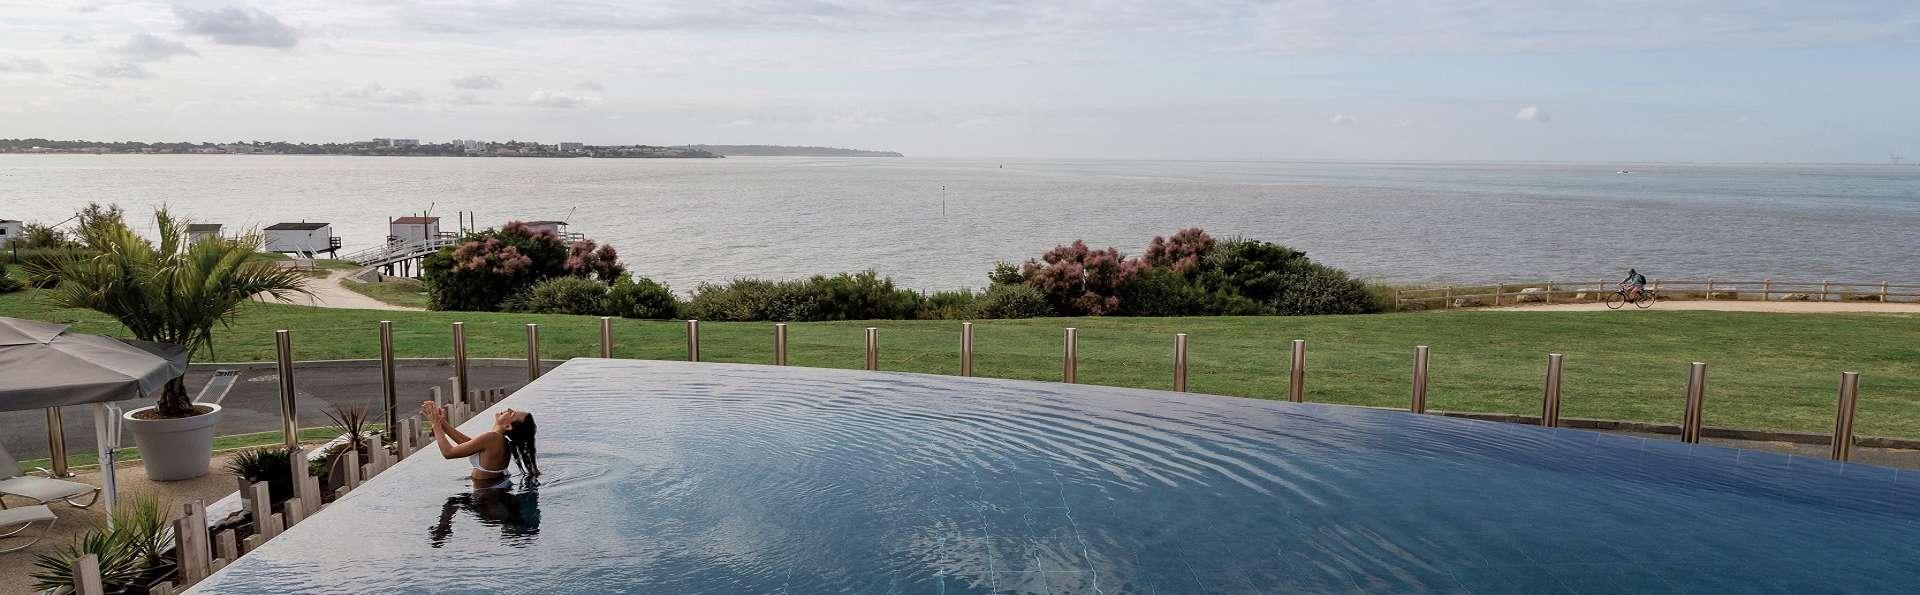 Hôtel Cordouan & Spa by Thalazur - EDIT_piscine.jpg